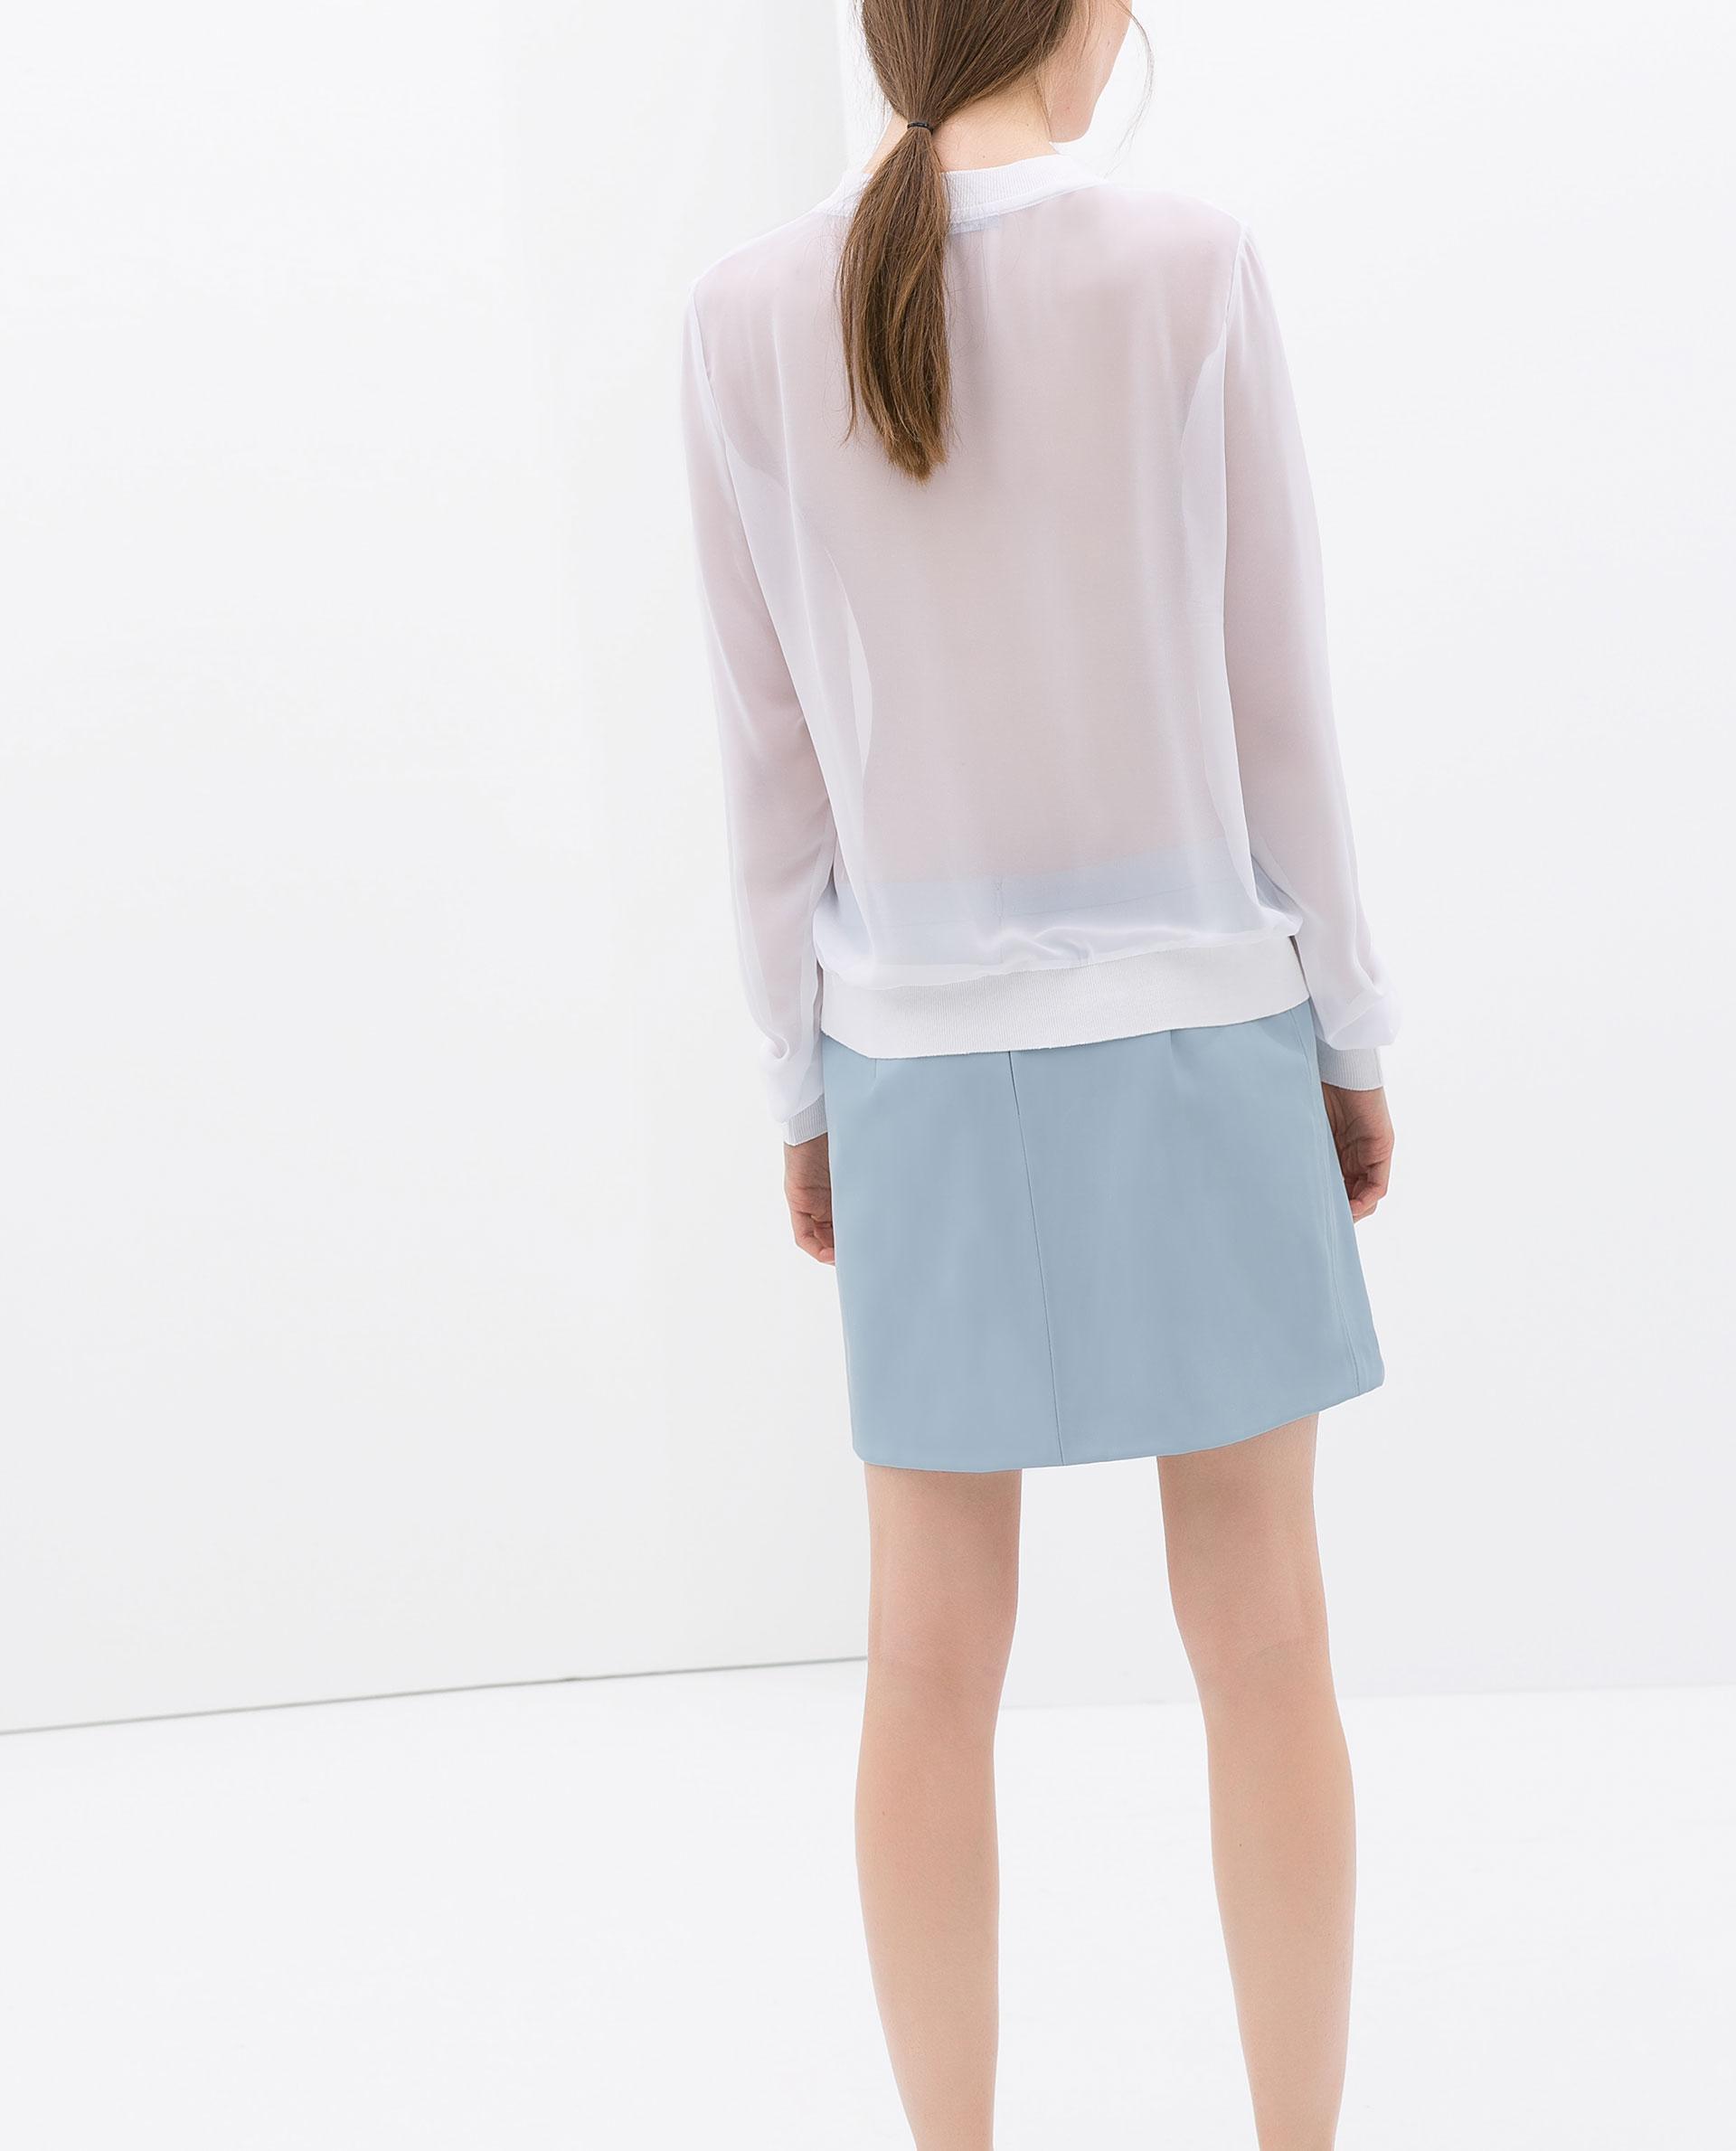 Zara Blouse With Transparent Details 111